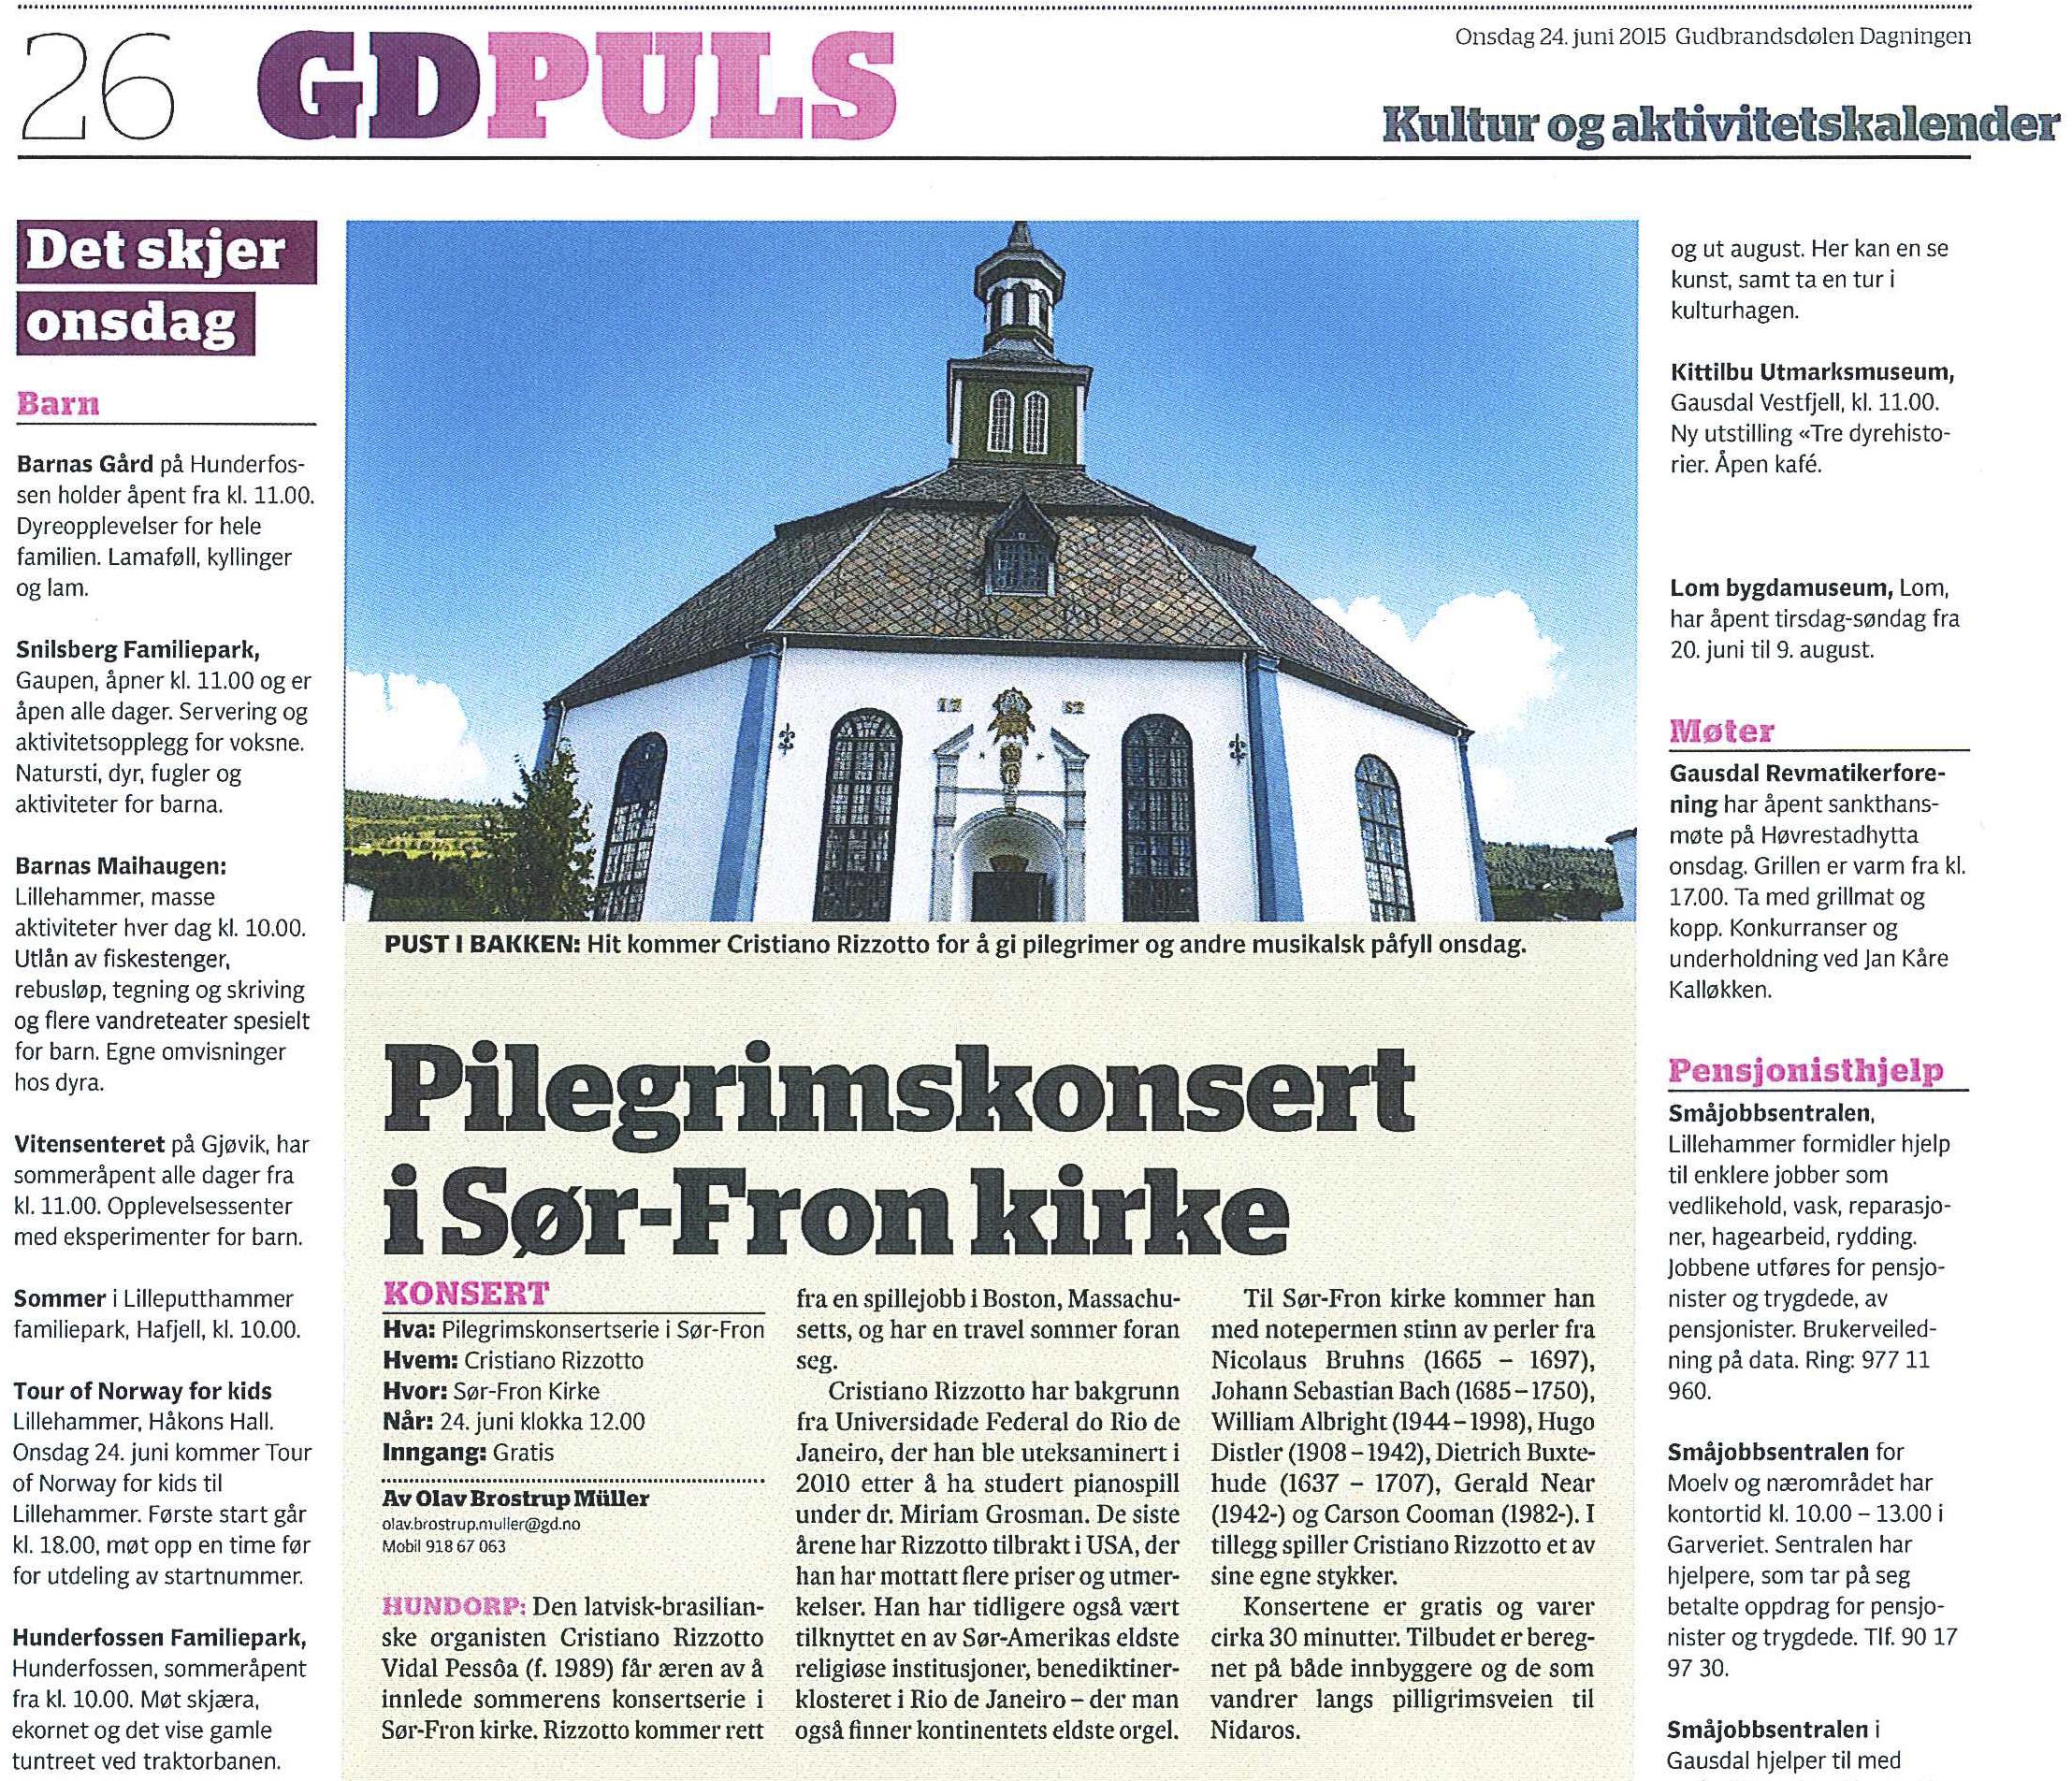 Gudbrandsdølen Dagningen (GDplus • www.gd.no) - Cristiano Rizzotto in Norway